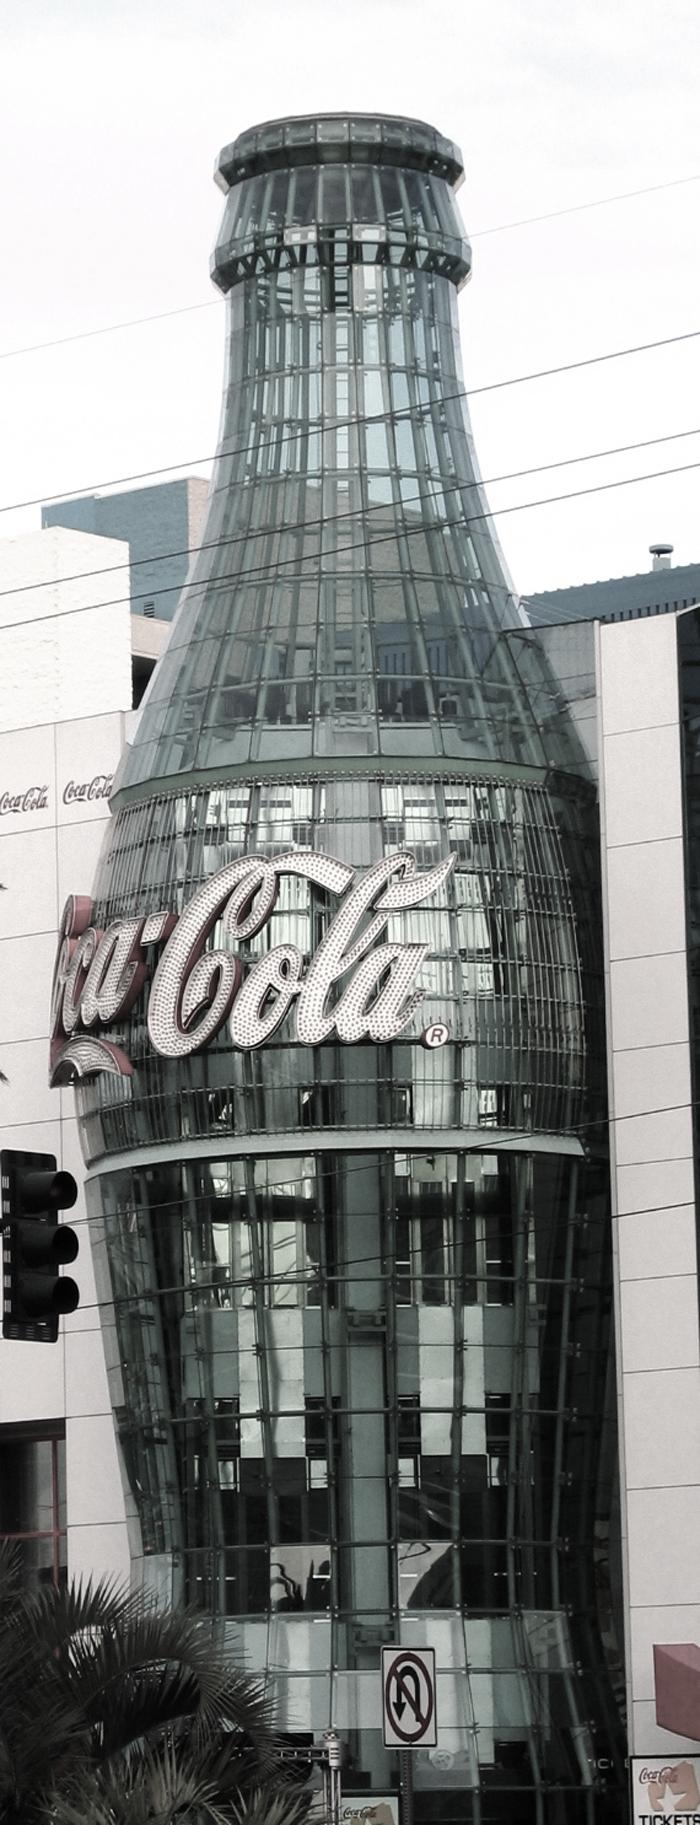 The-World-of-Coca-Cola,-Pemberton-Place,-Atlanta,-USA